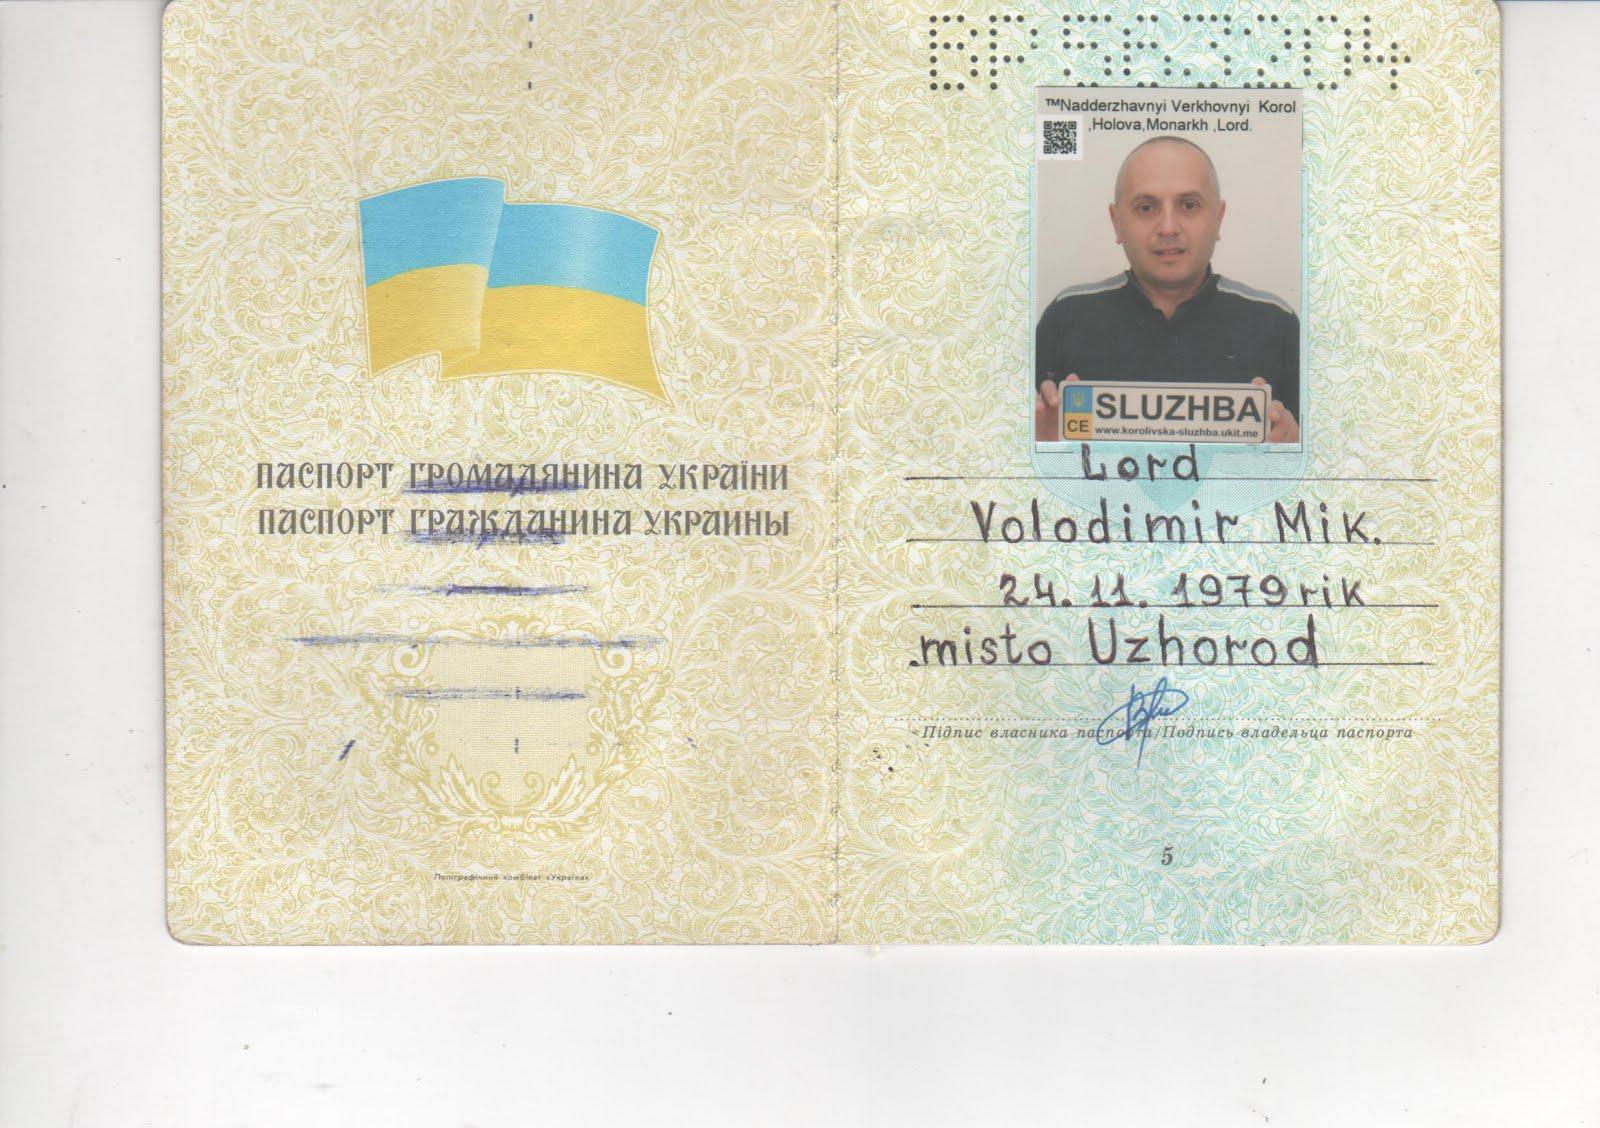 Mij Pasport - Lord Vladimir Mik.